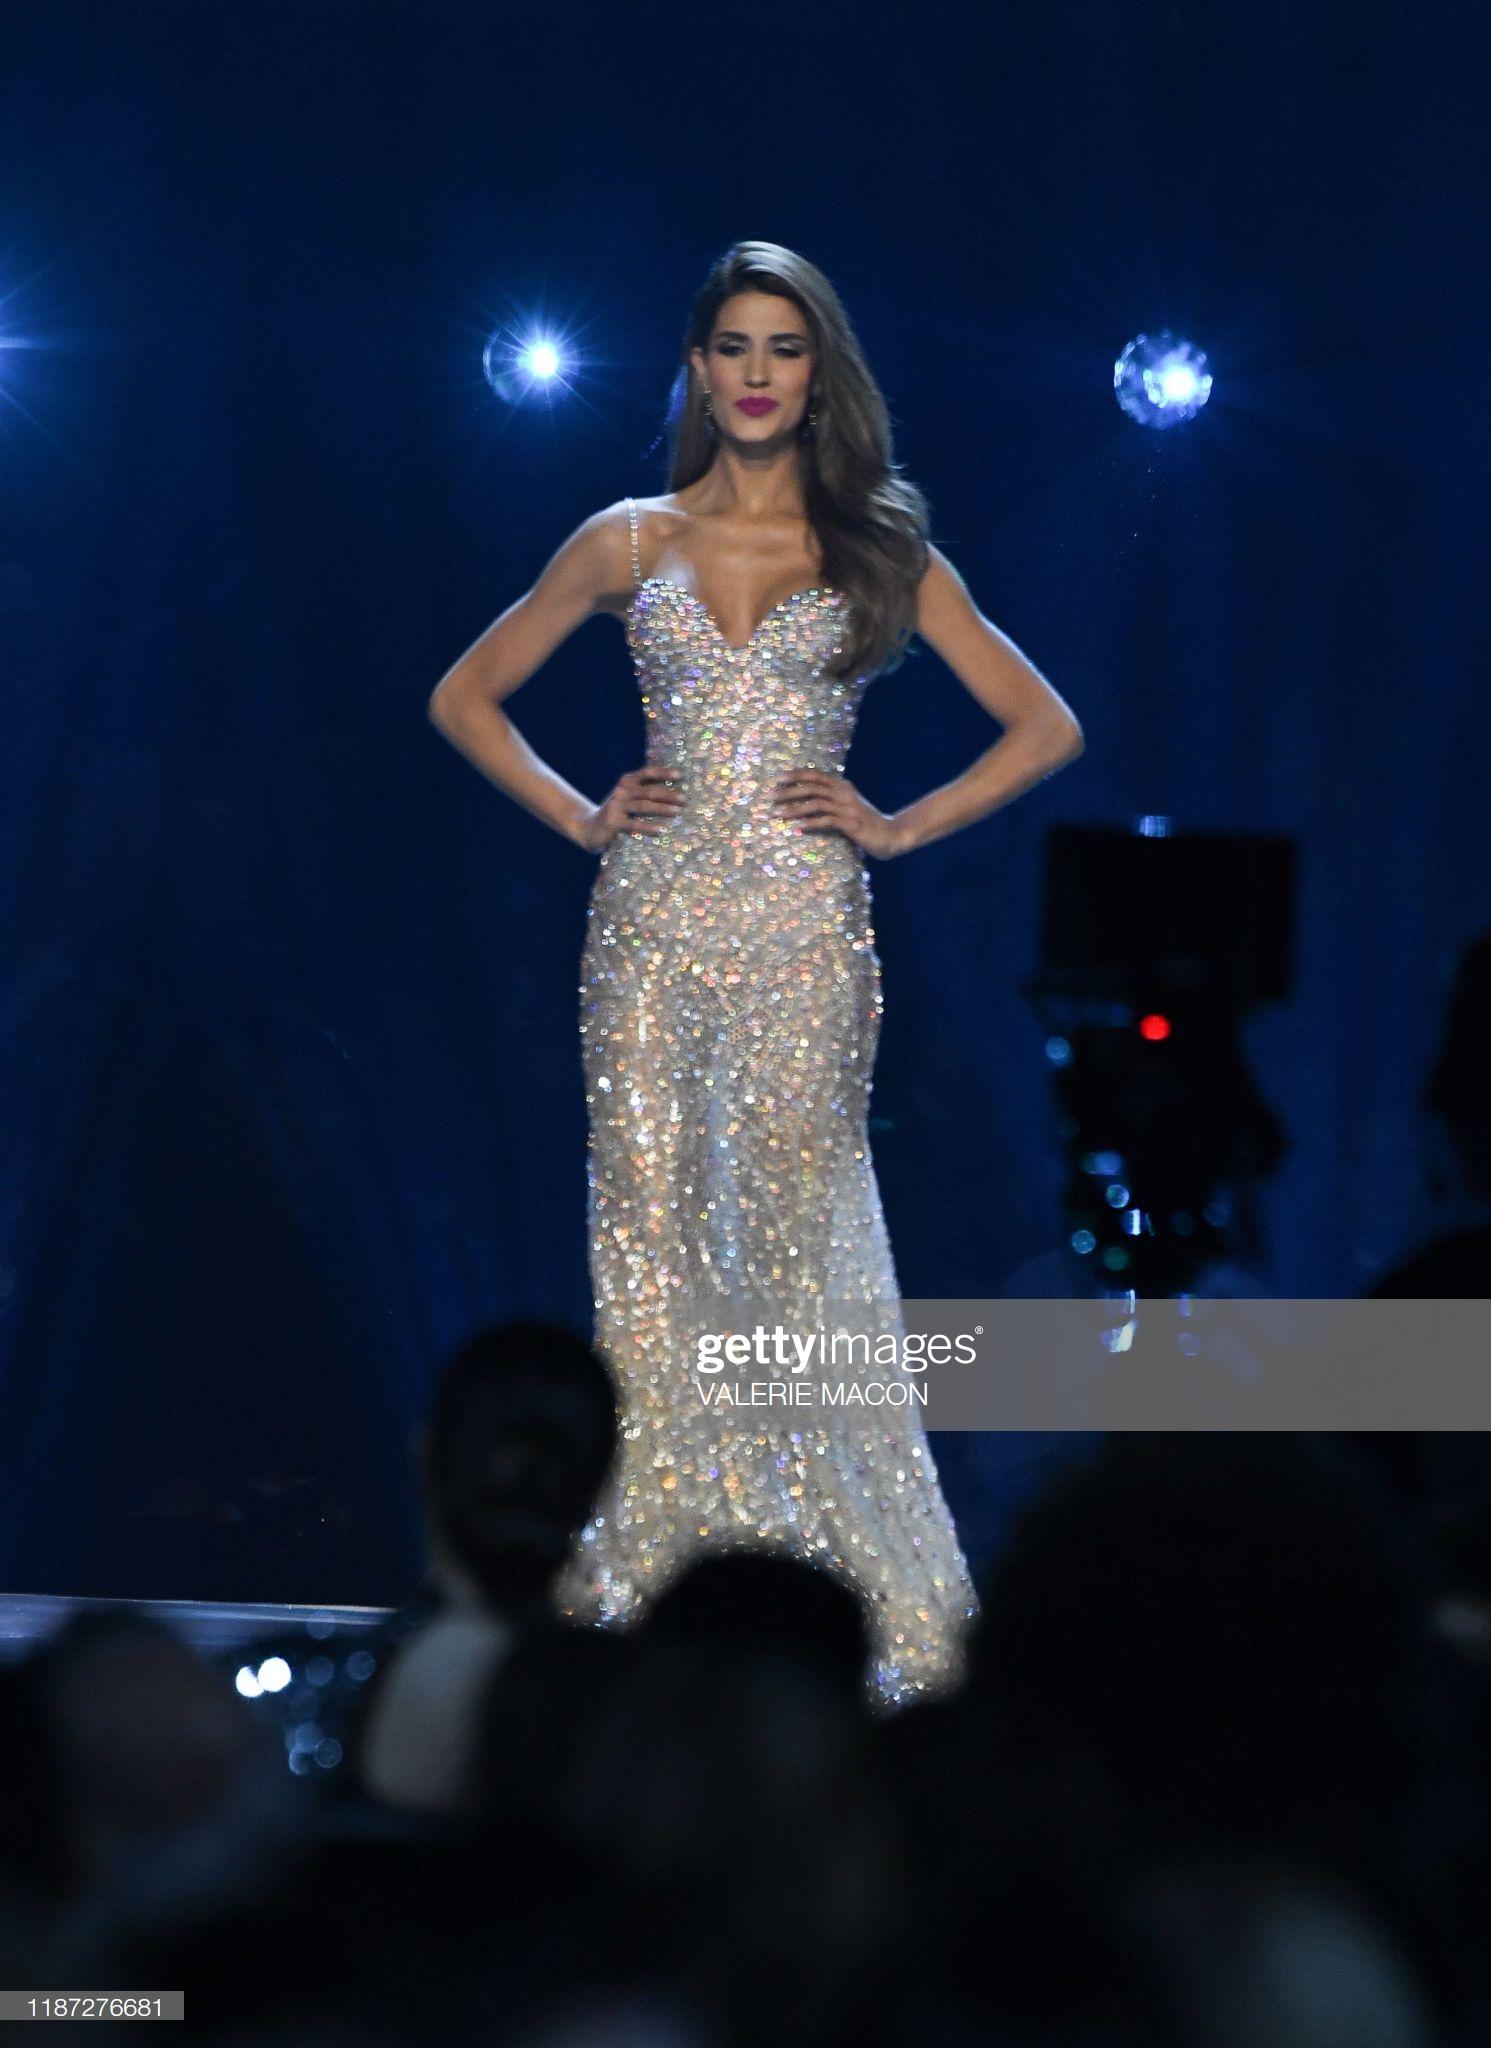 gabriela tafur, top 5 de miss universe 2019. - Página 27 Miss-c11